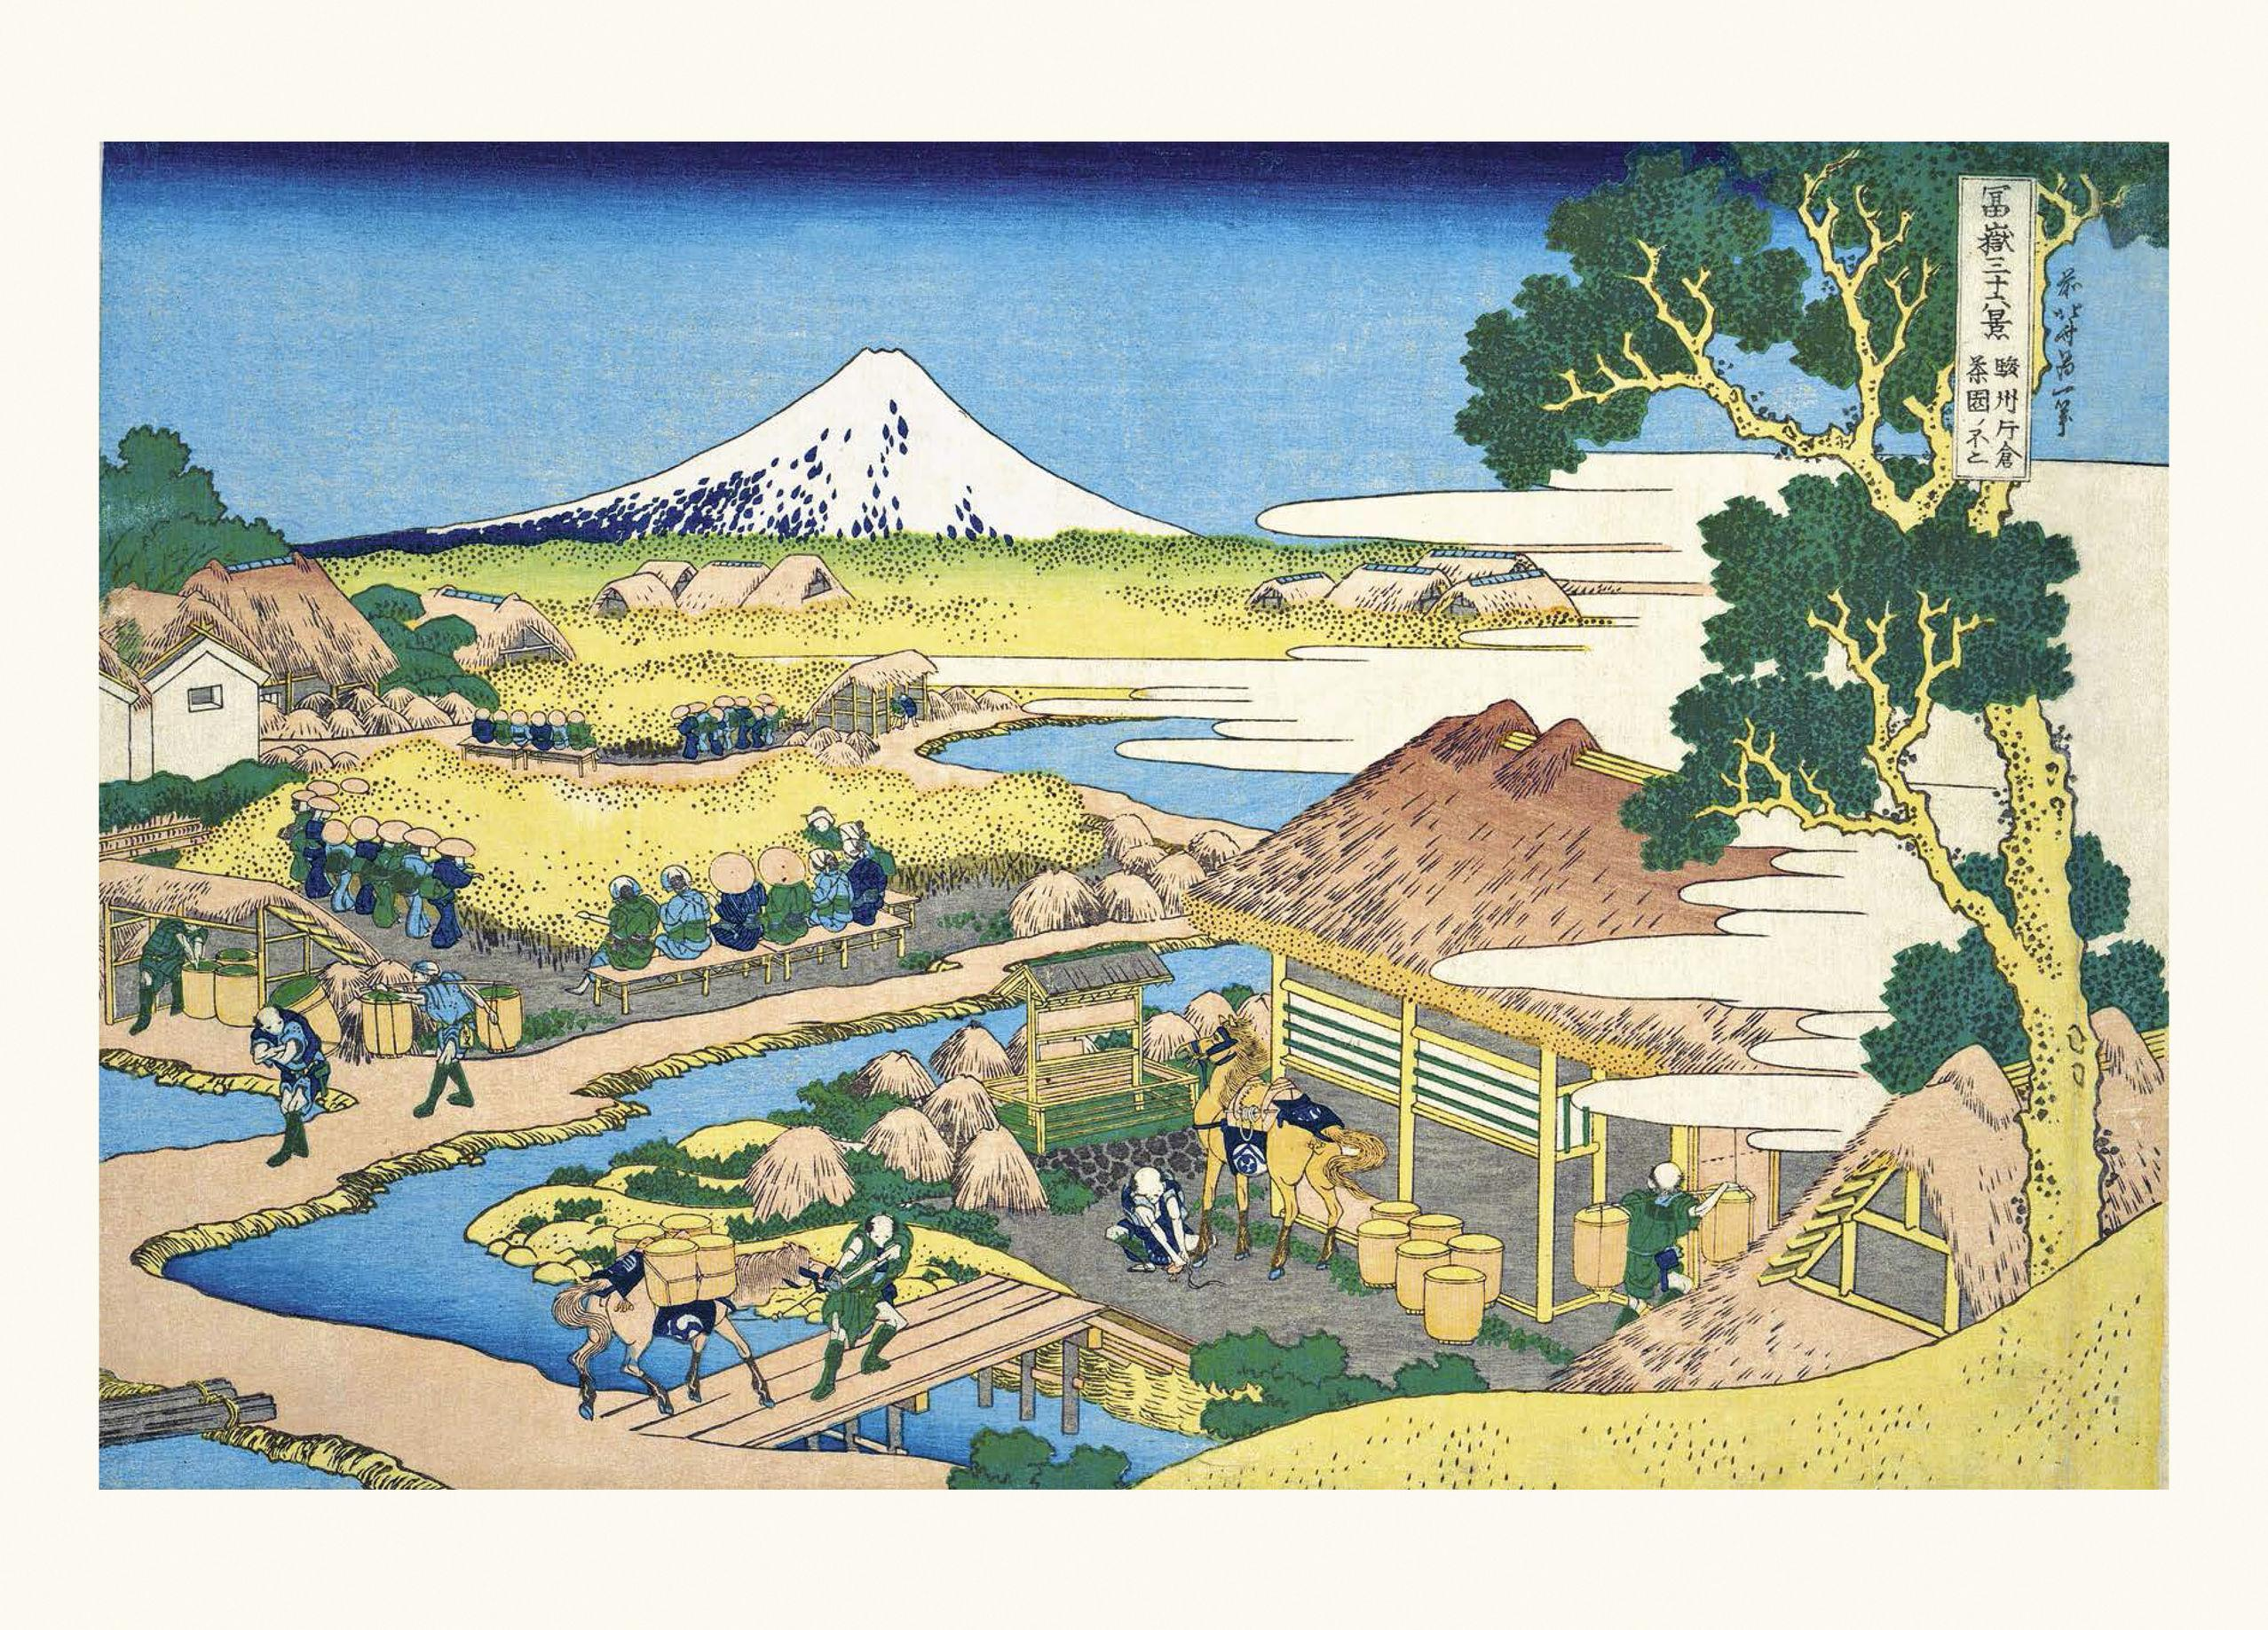 Rot Fuji Japanische Holzschnitt von Hokusai /& Gratis Iris Poster 36 Ansichten